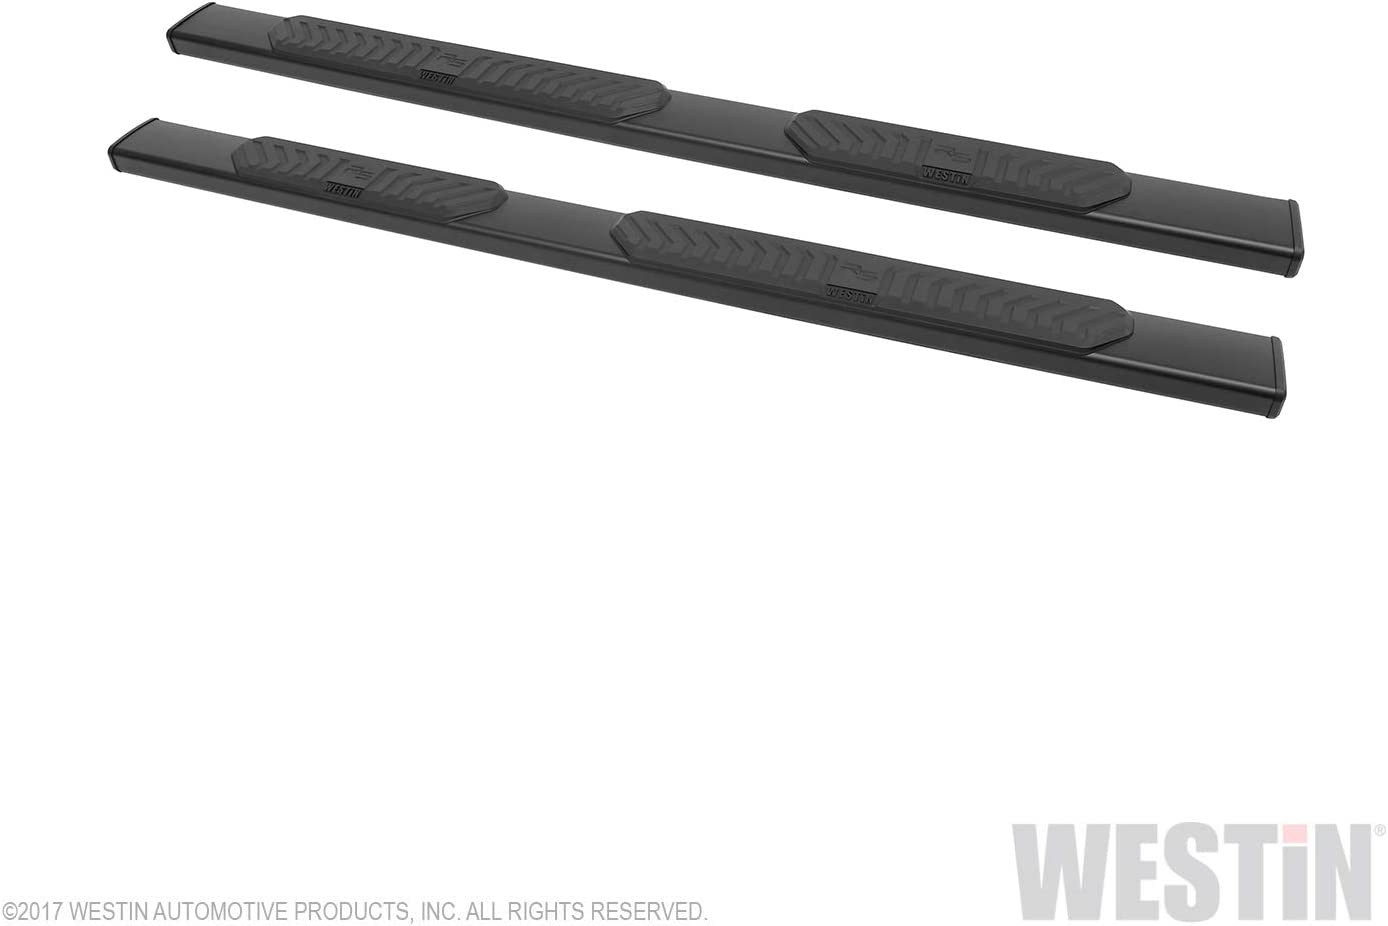 1 Pack Westin Automotive Product 28-51185 Black Step Bar